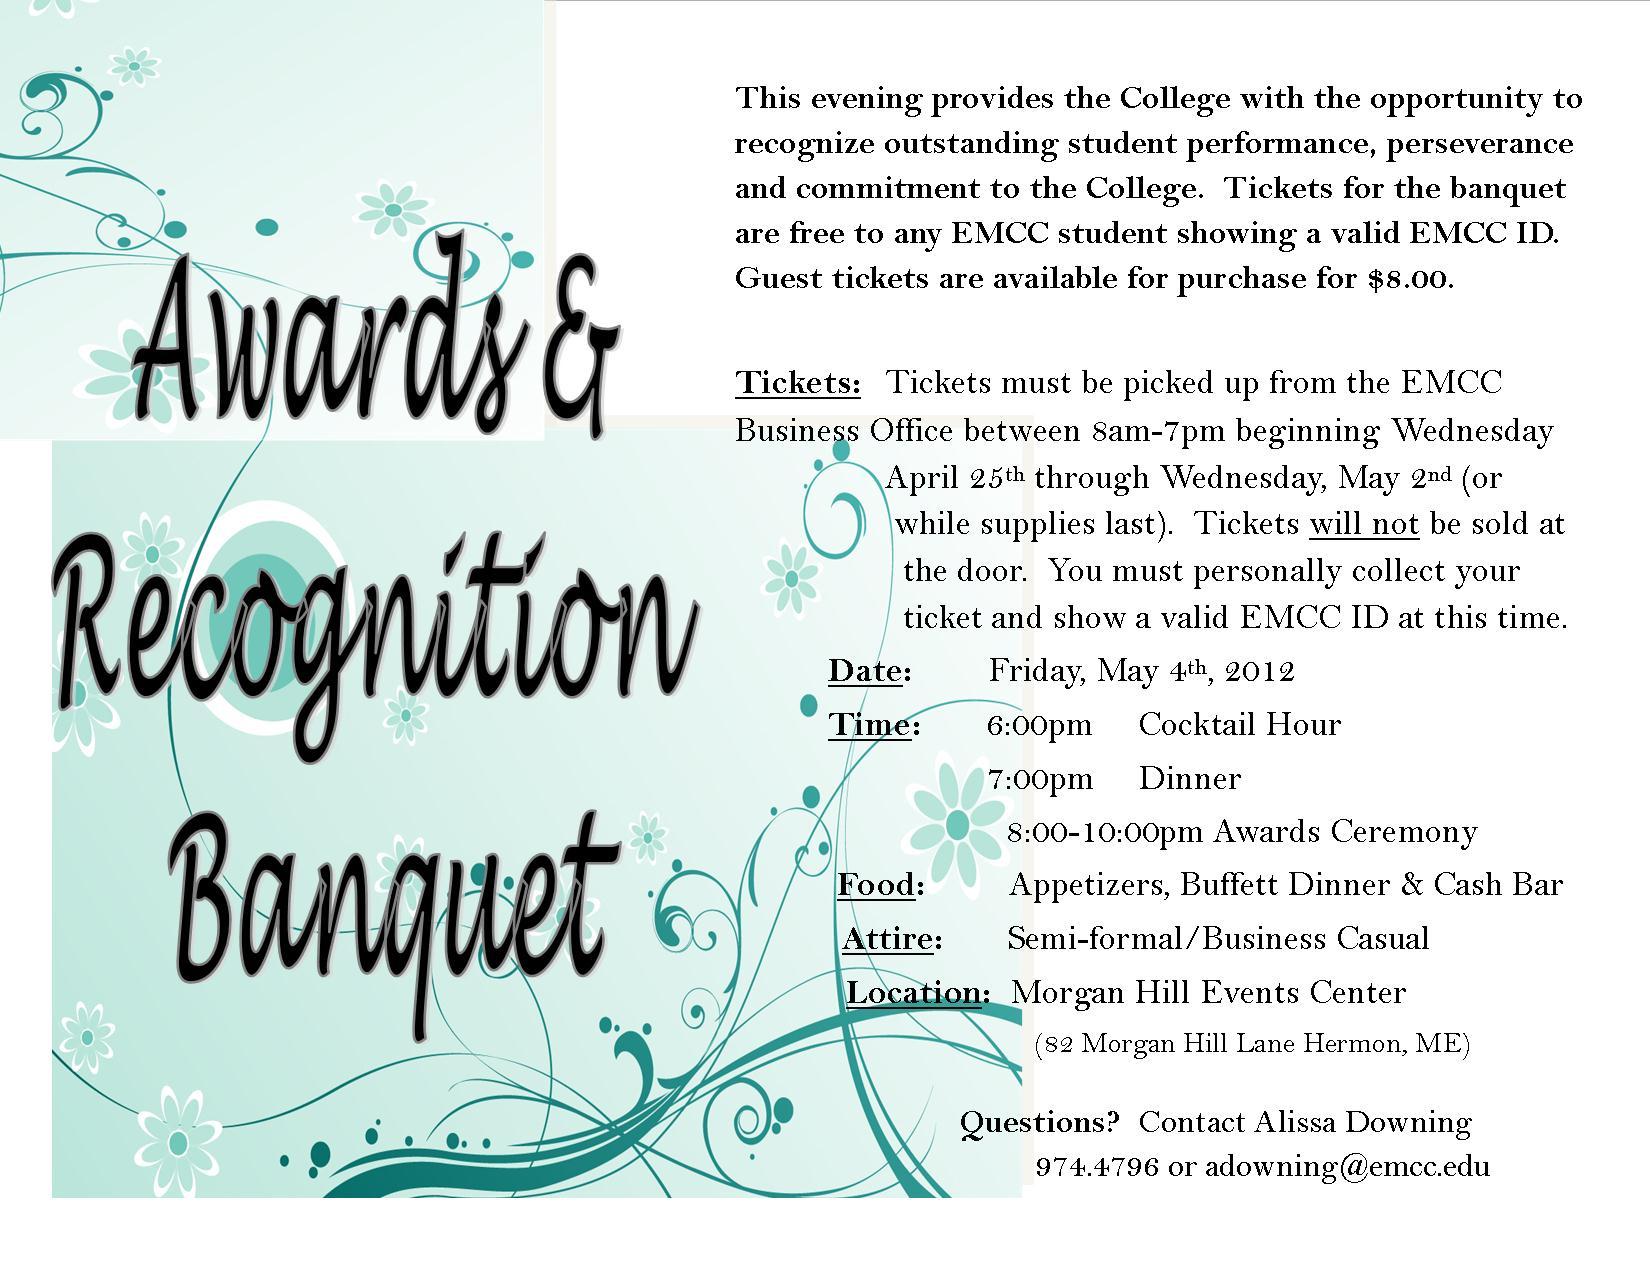 Sports Banquet Invitation Sample